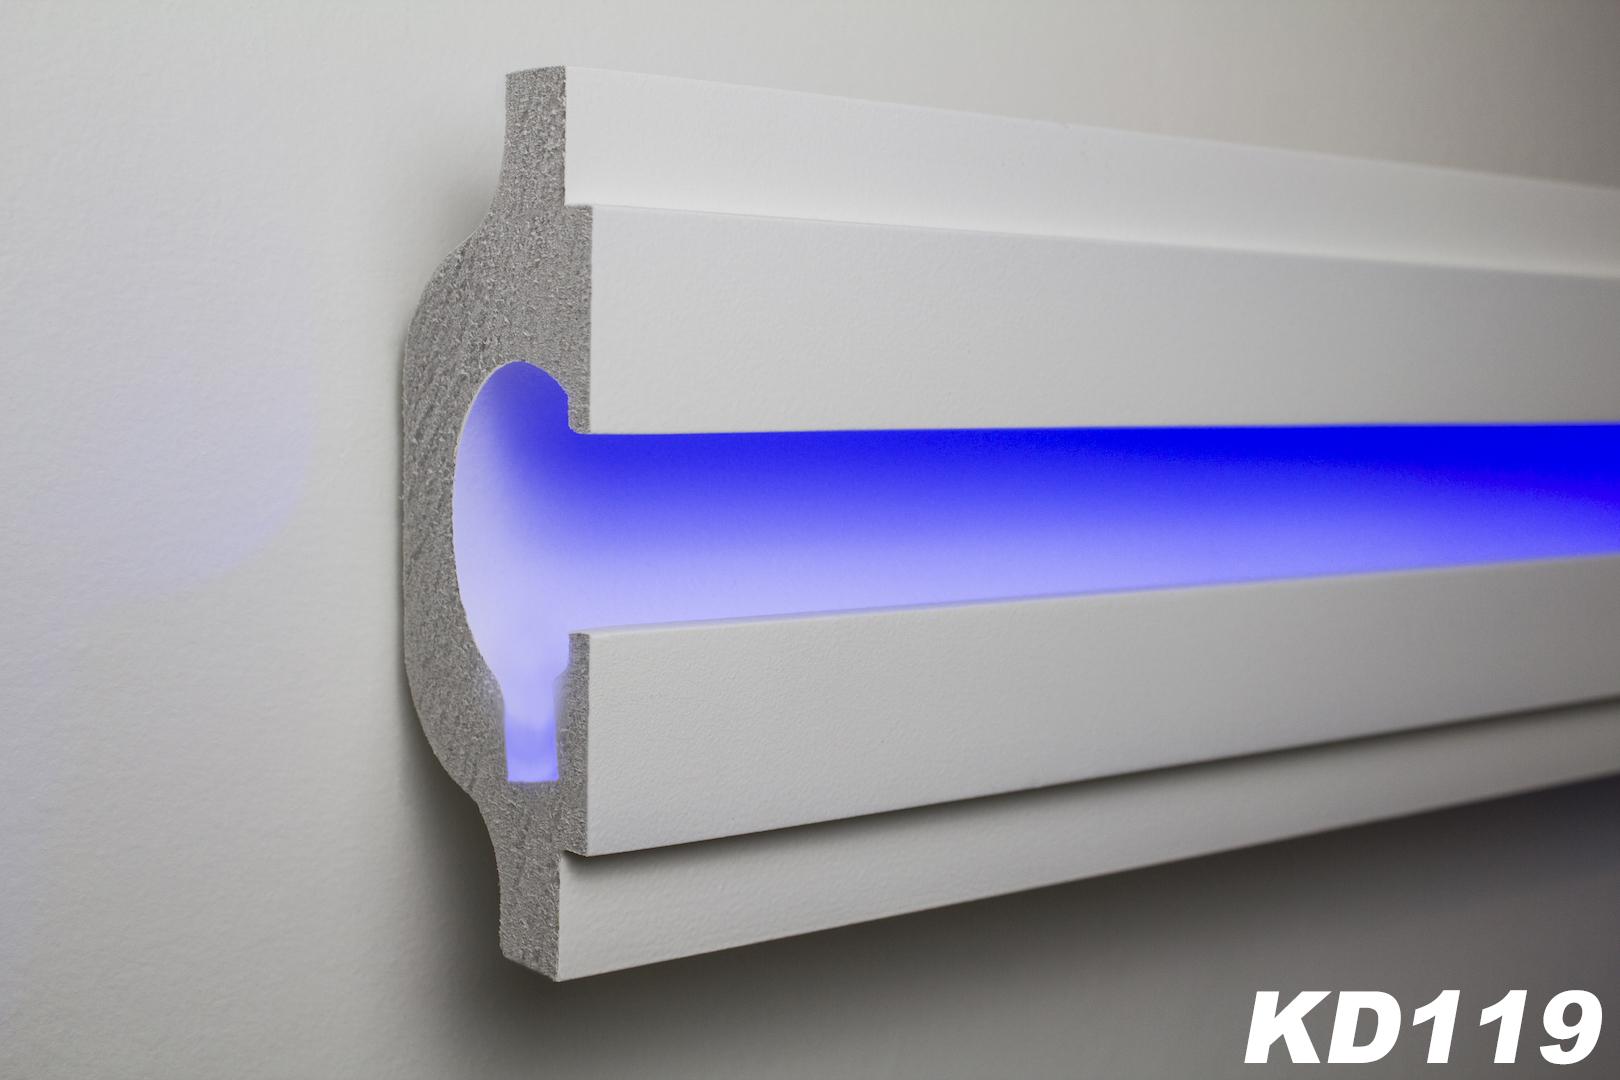 1 15 meter led stucco strip for indirect lighting xps - Led skirting board lighting ...